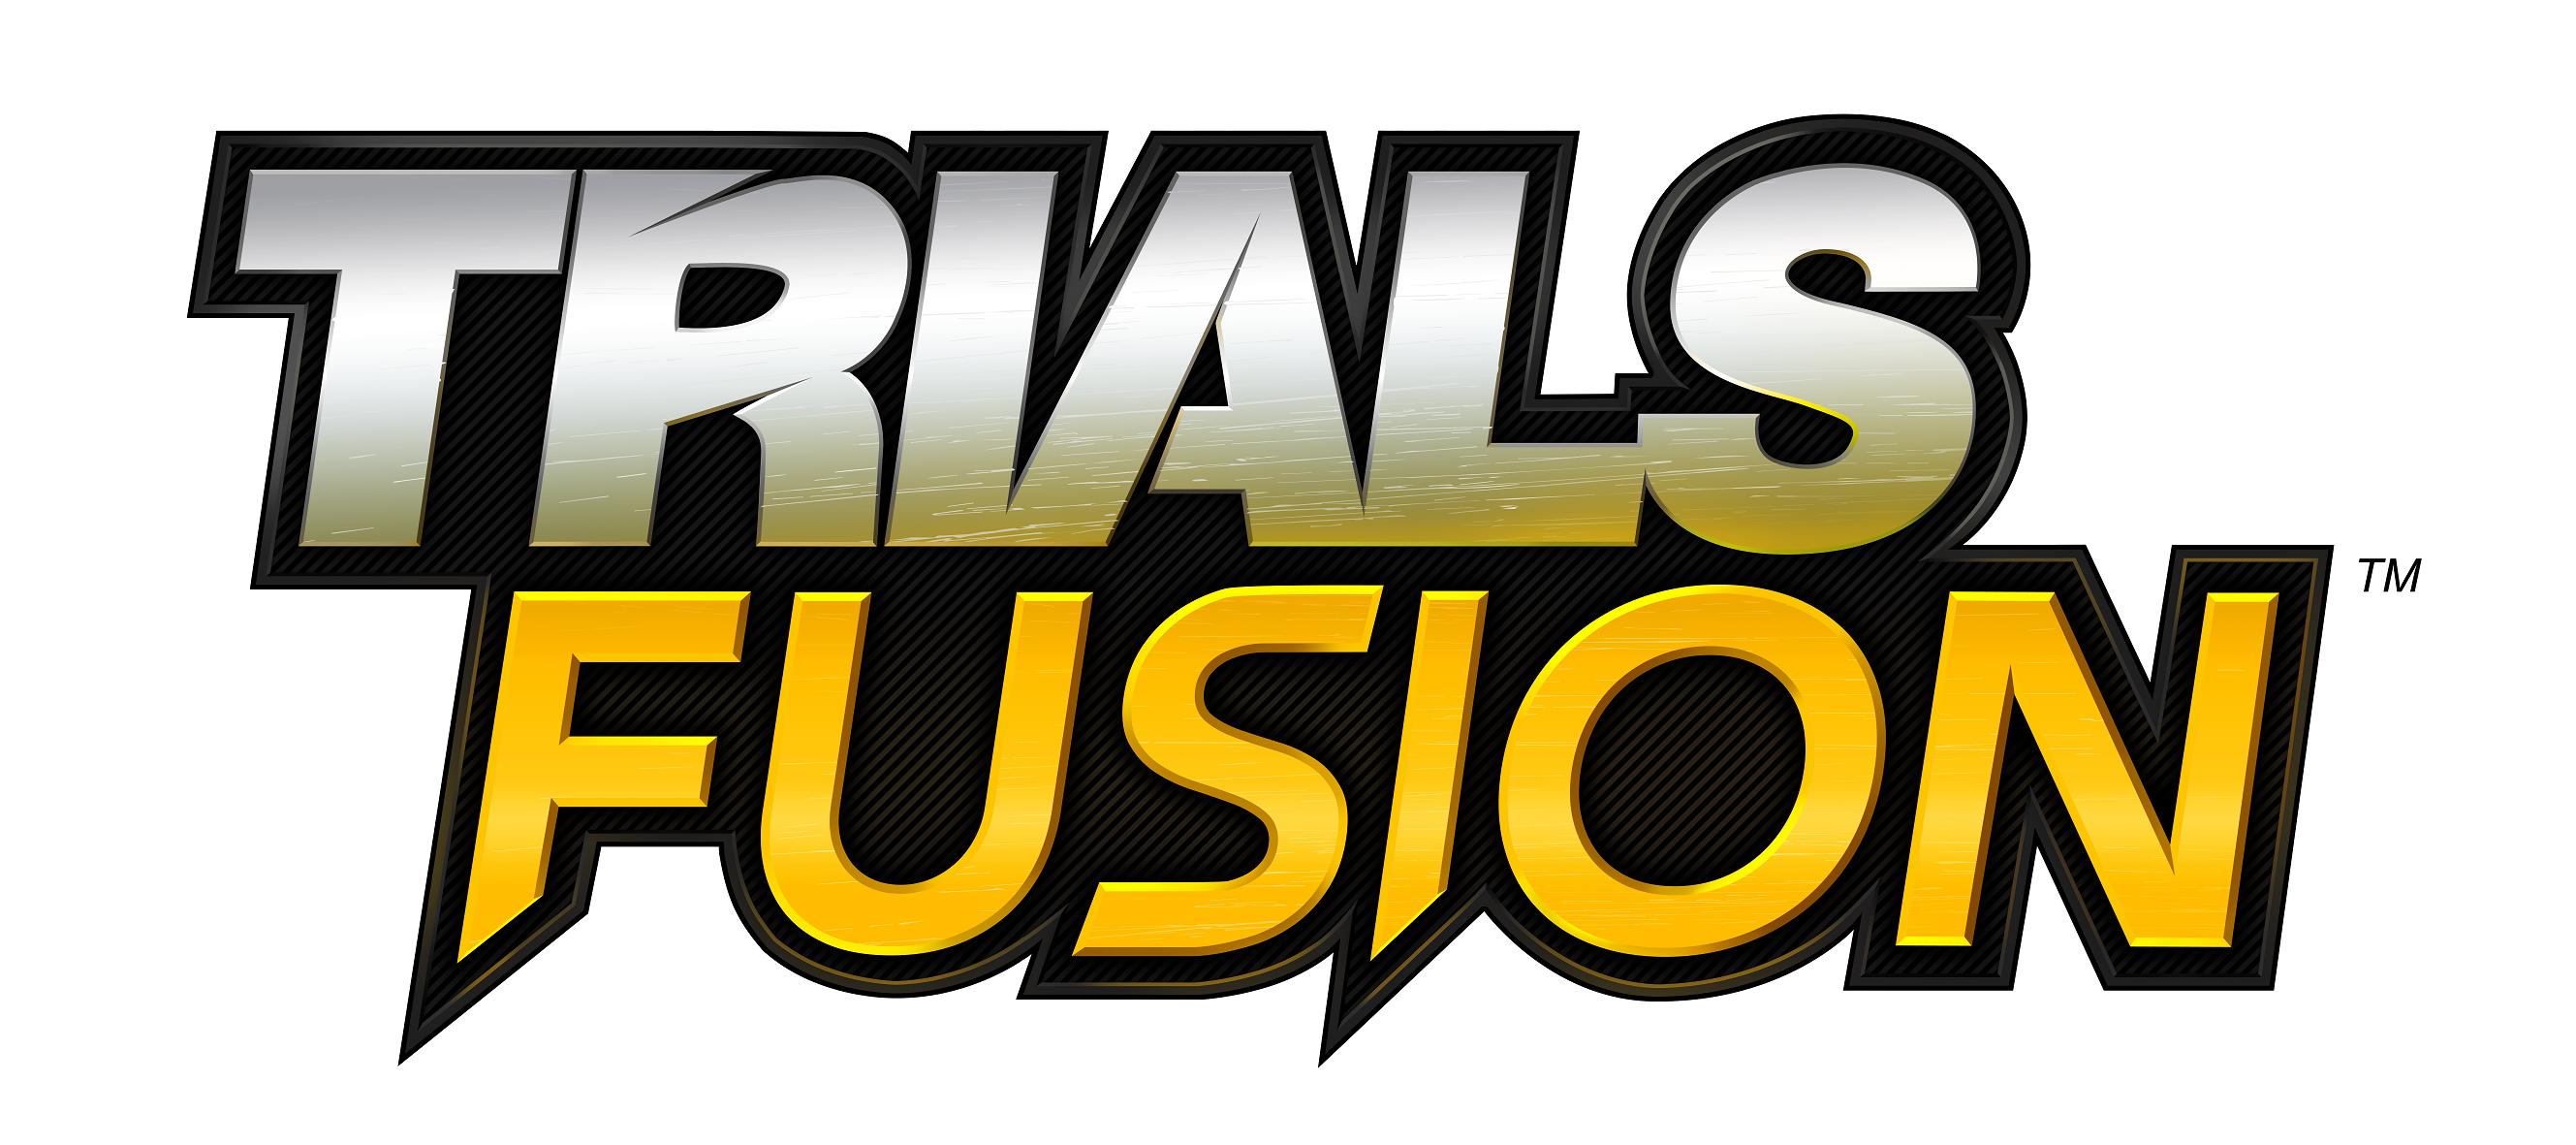 fichiertrials fusion logopng � wikip233dia